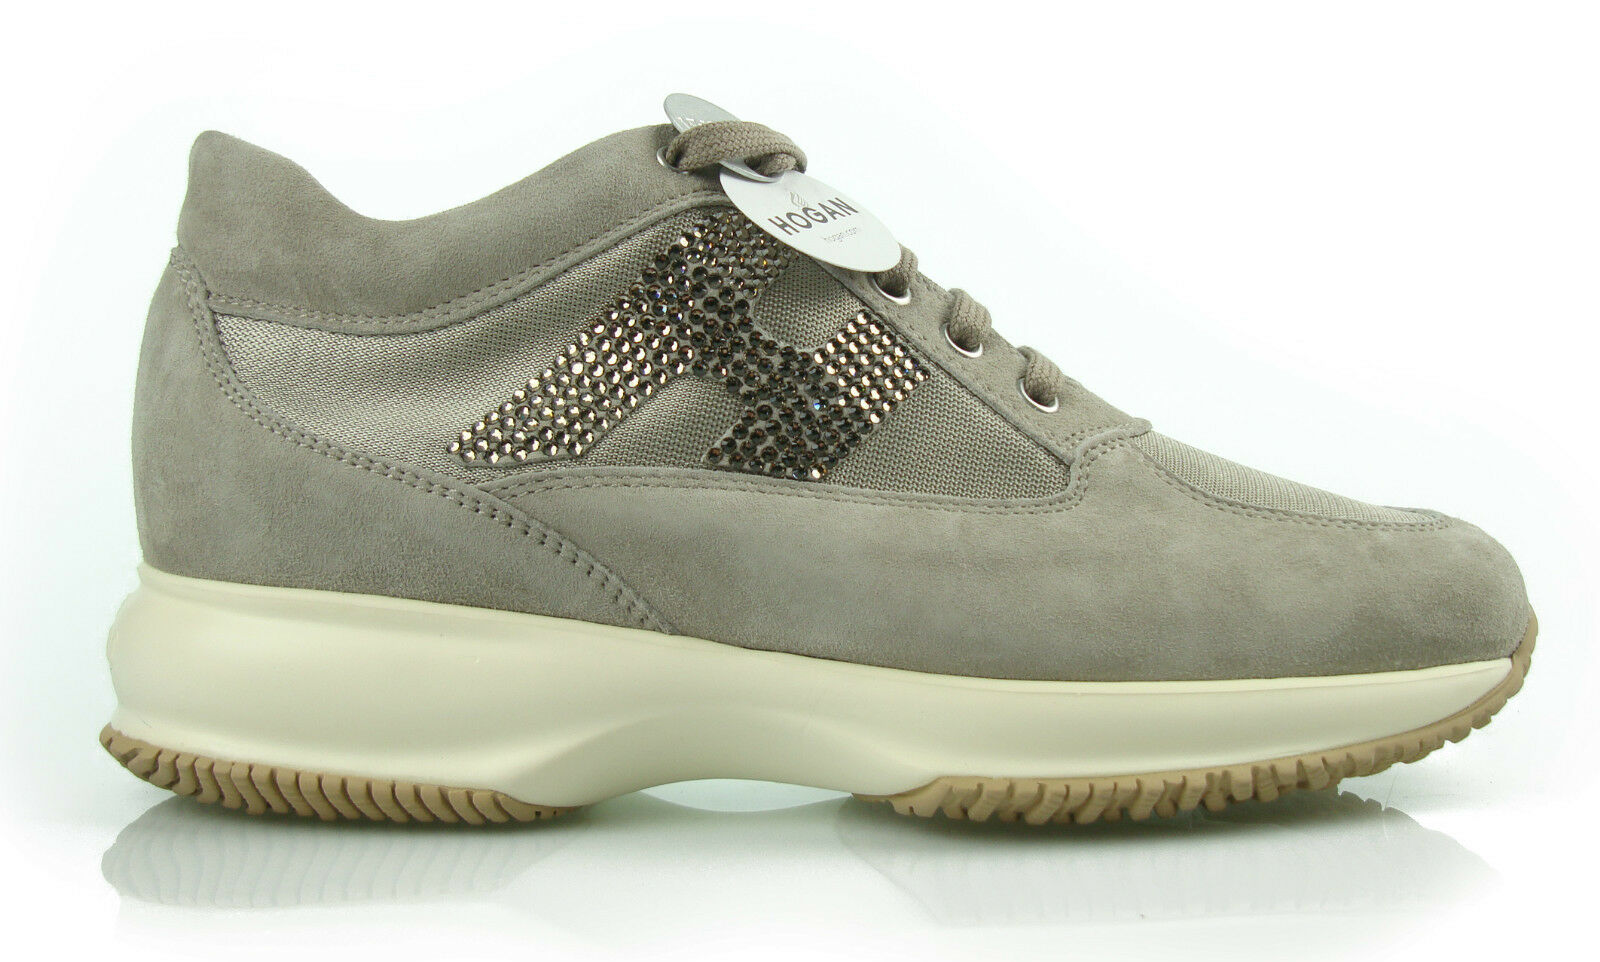 H2 HOGAN INTERACTIF STRASS BEIGE Chaussures FEMMES 100%AUT